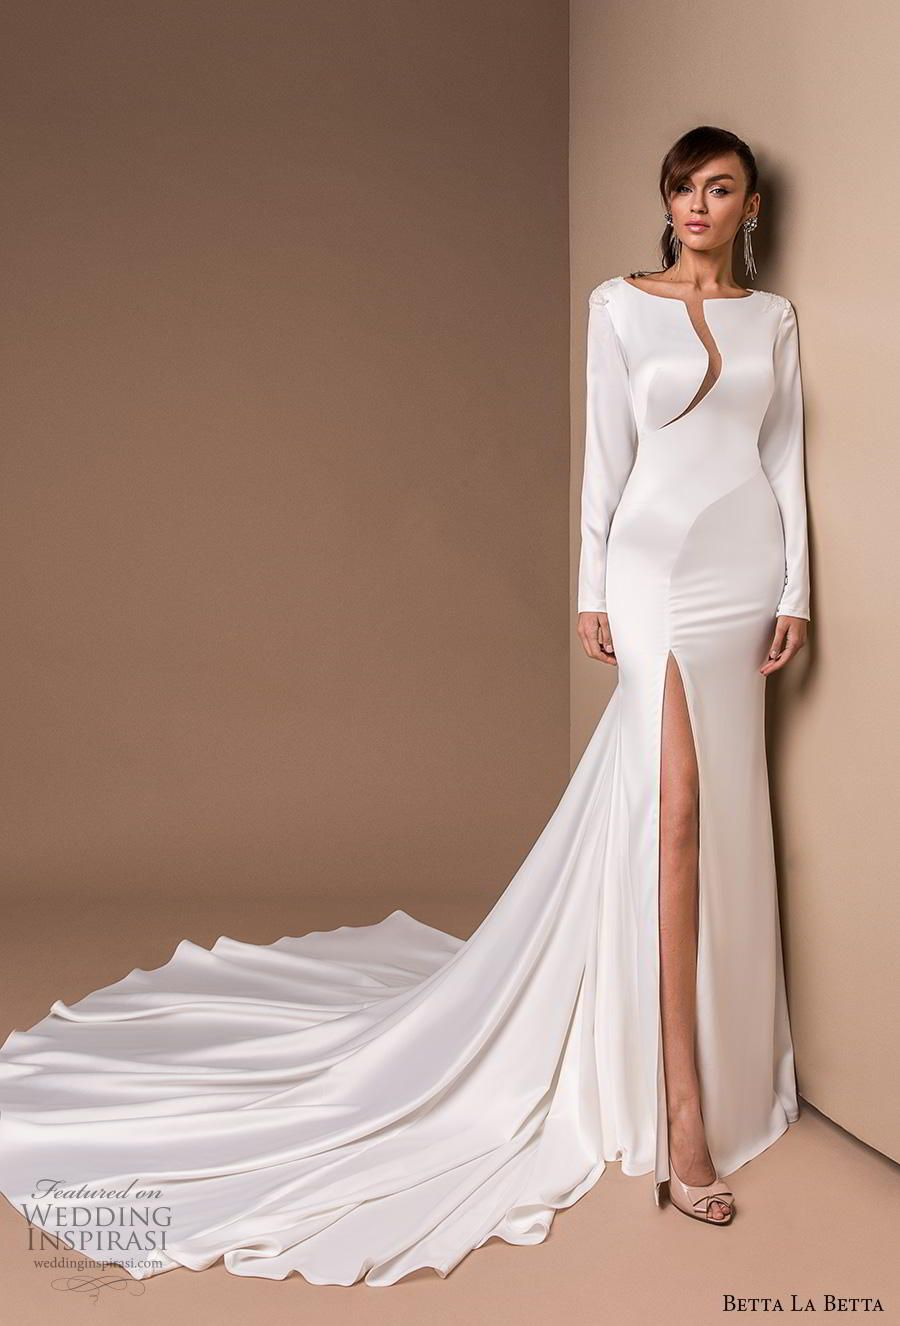 18 Simple But Classy Wedding Dresses Ideas Stunning Wedding Dresses Wedding Dresses Wedding Dresses Simple [ 1675 x 800 Pixel ]